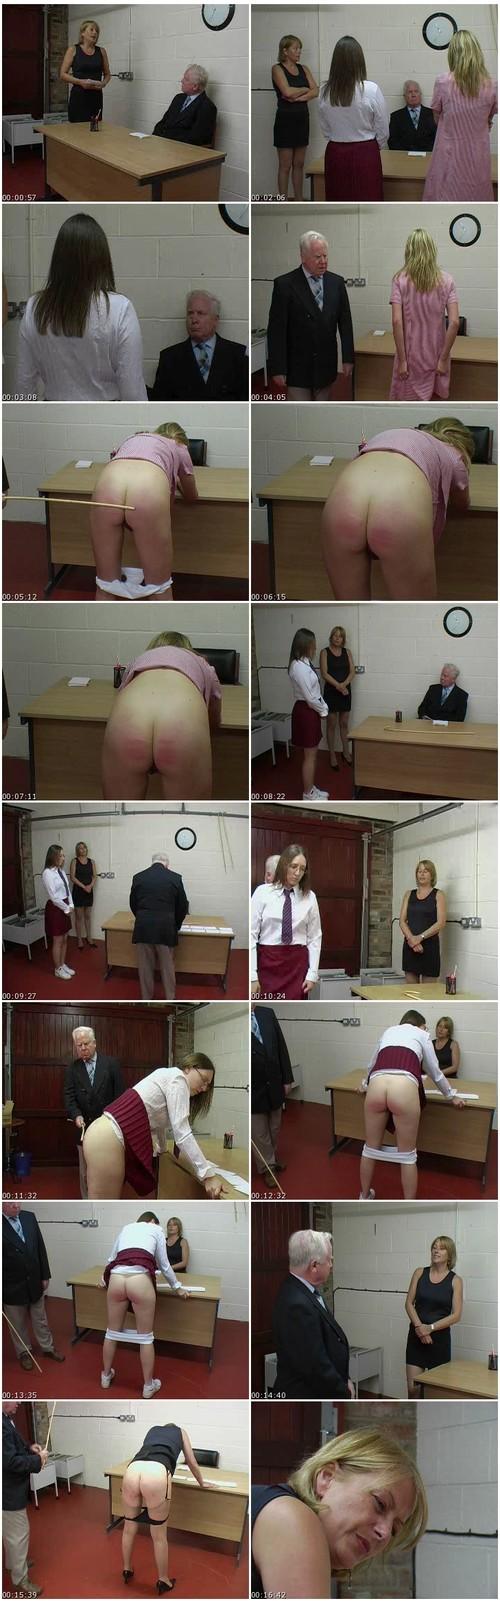 spanking050_thumb_m.jpg